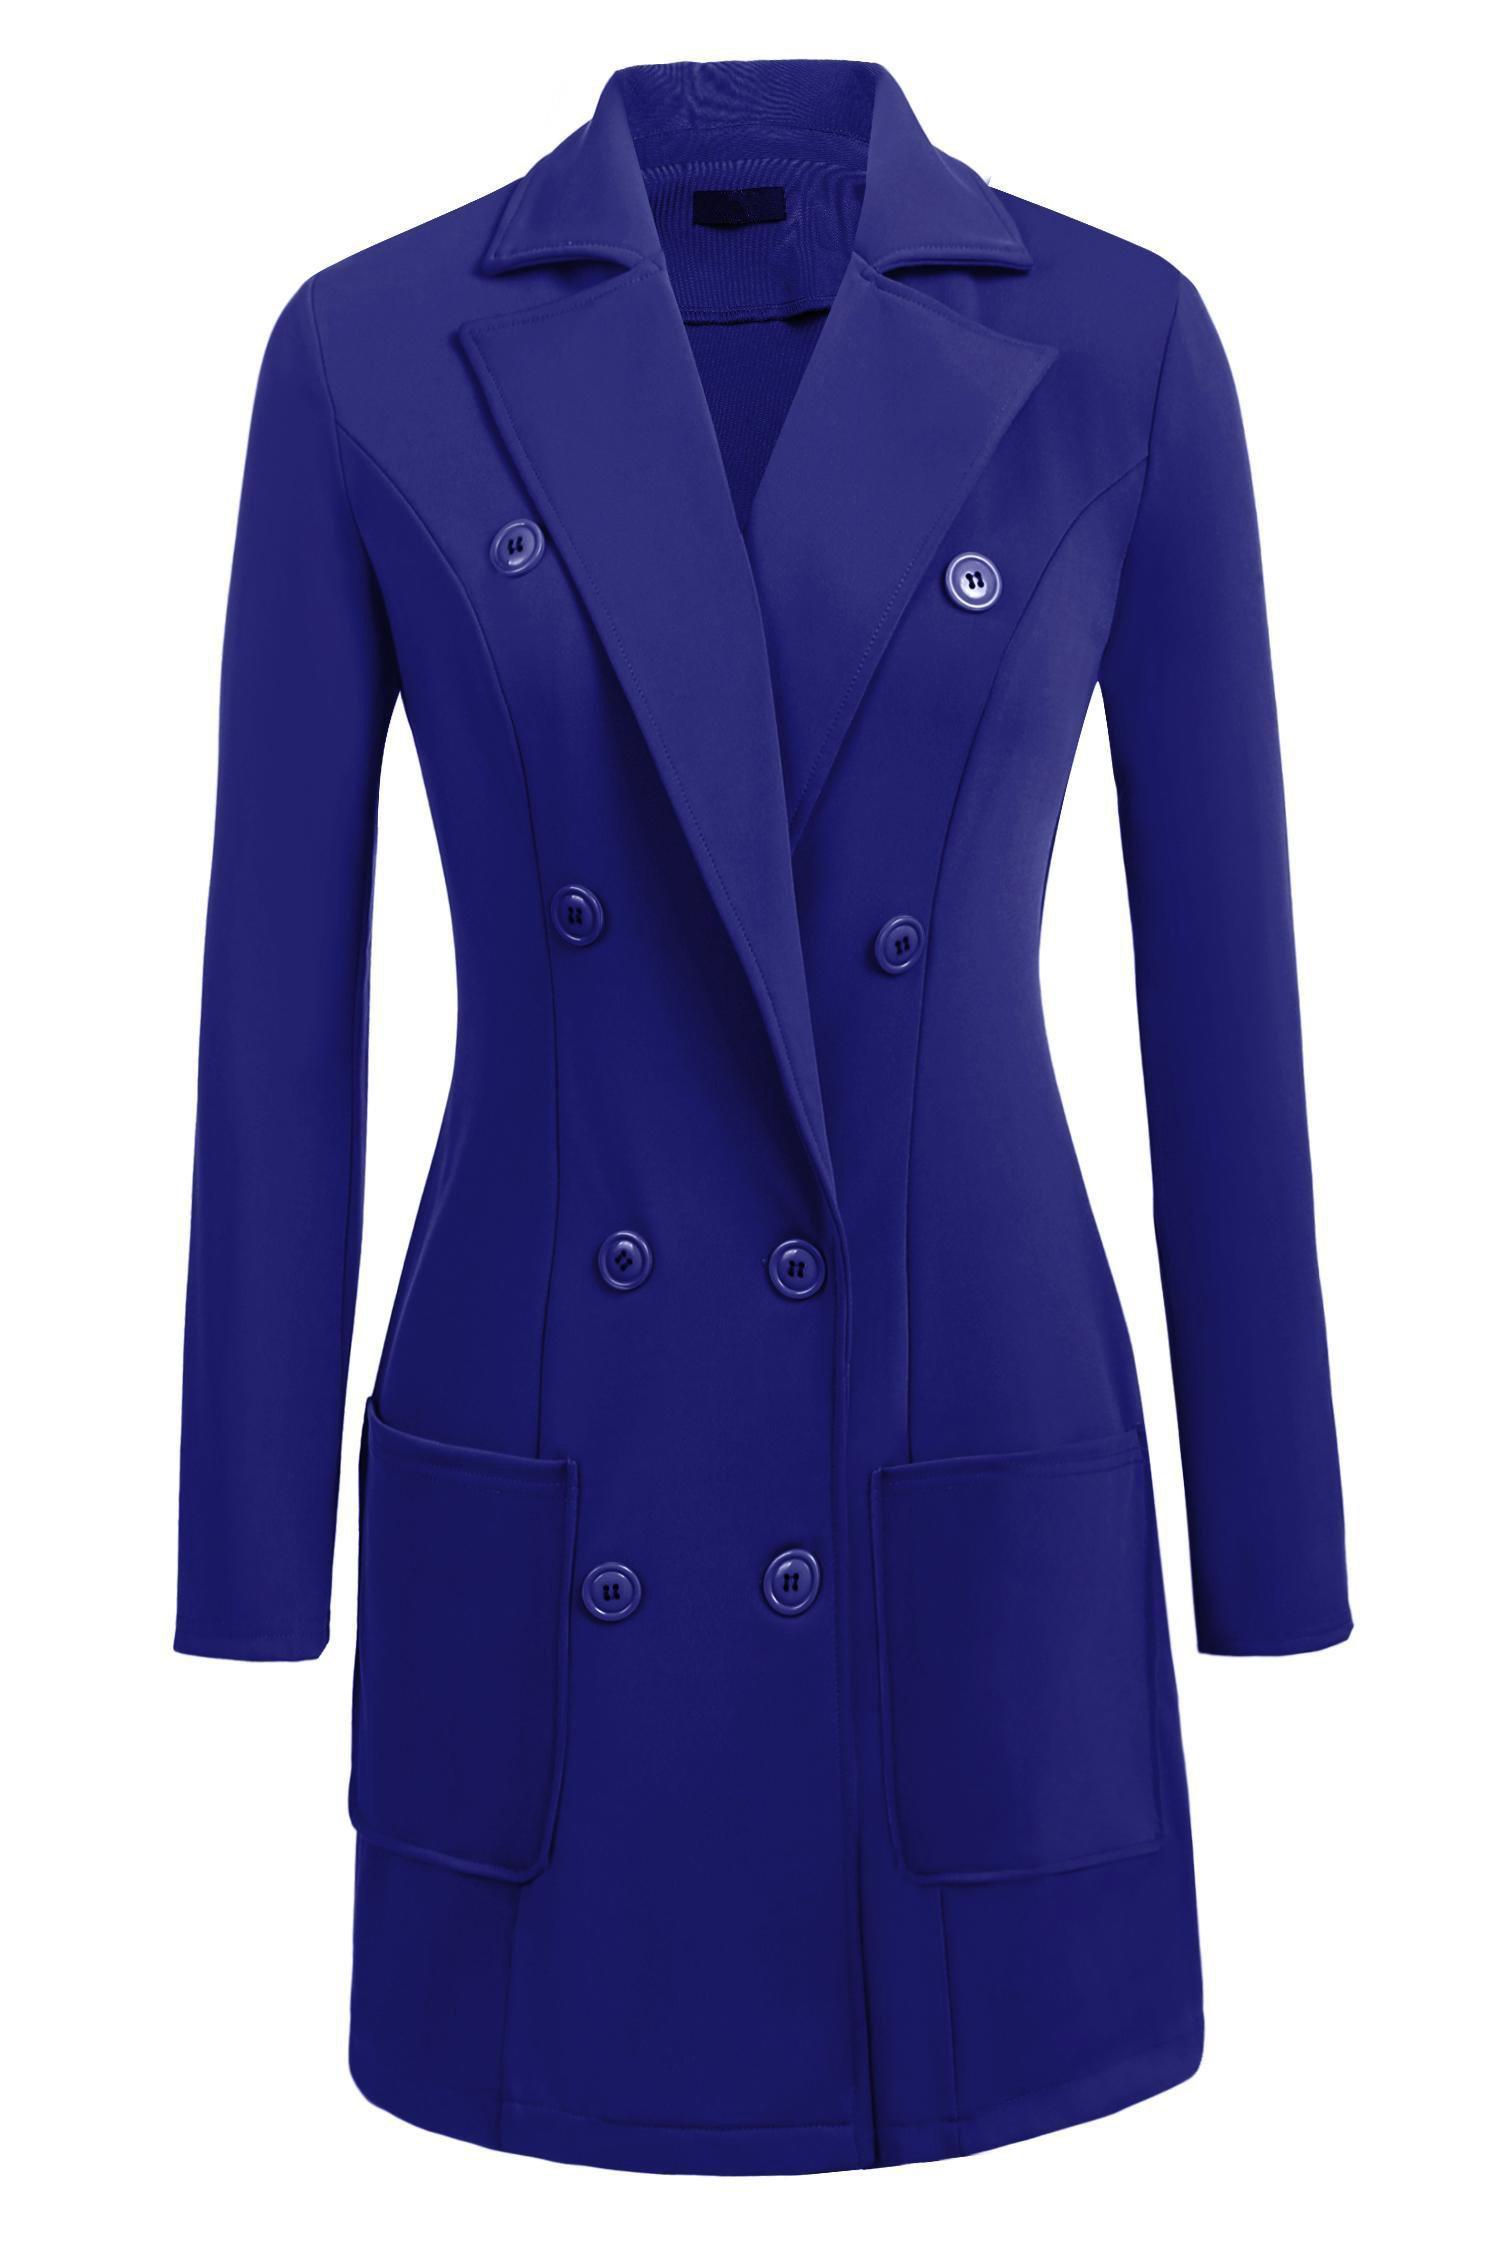 Zeagoo Women's Winter Fashion Outdoor Warm Classic Pea Coat Jacket Blue M